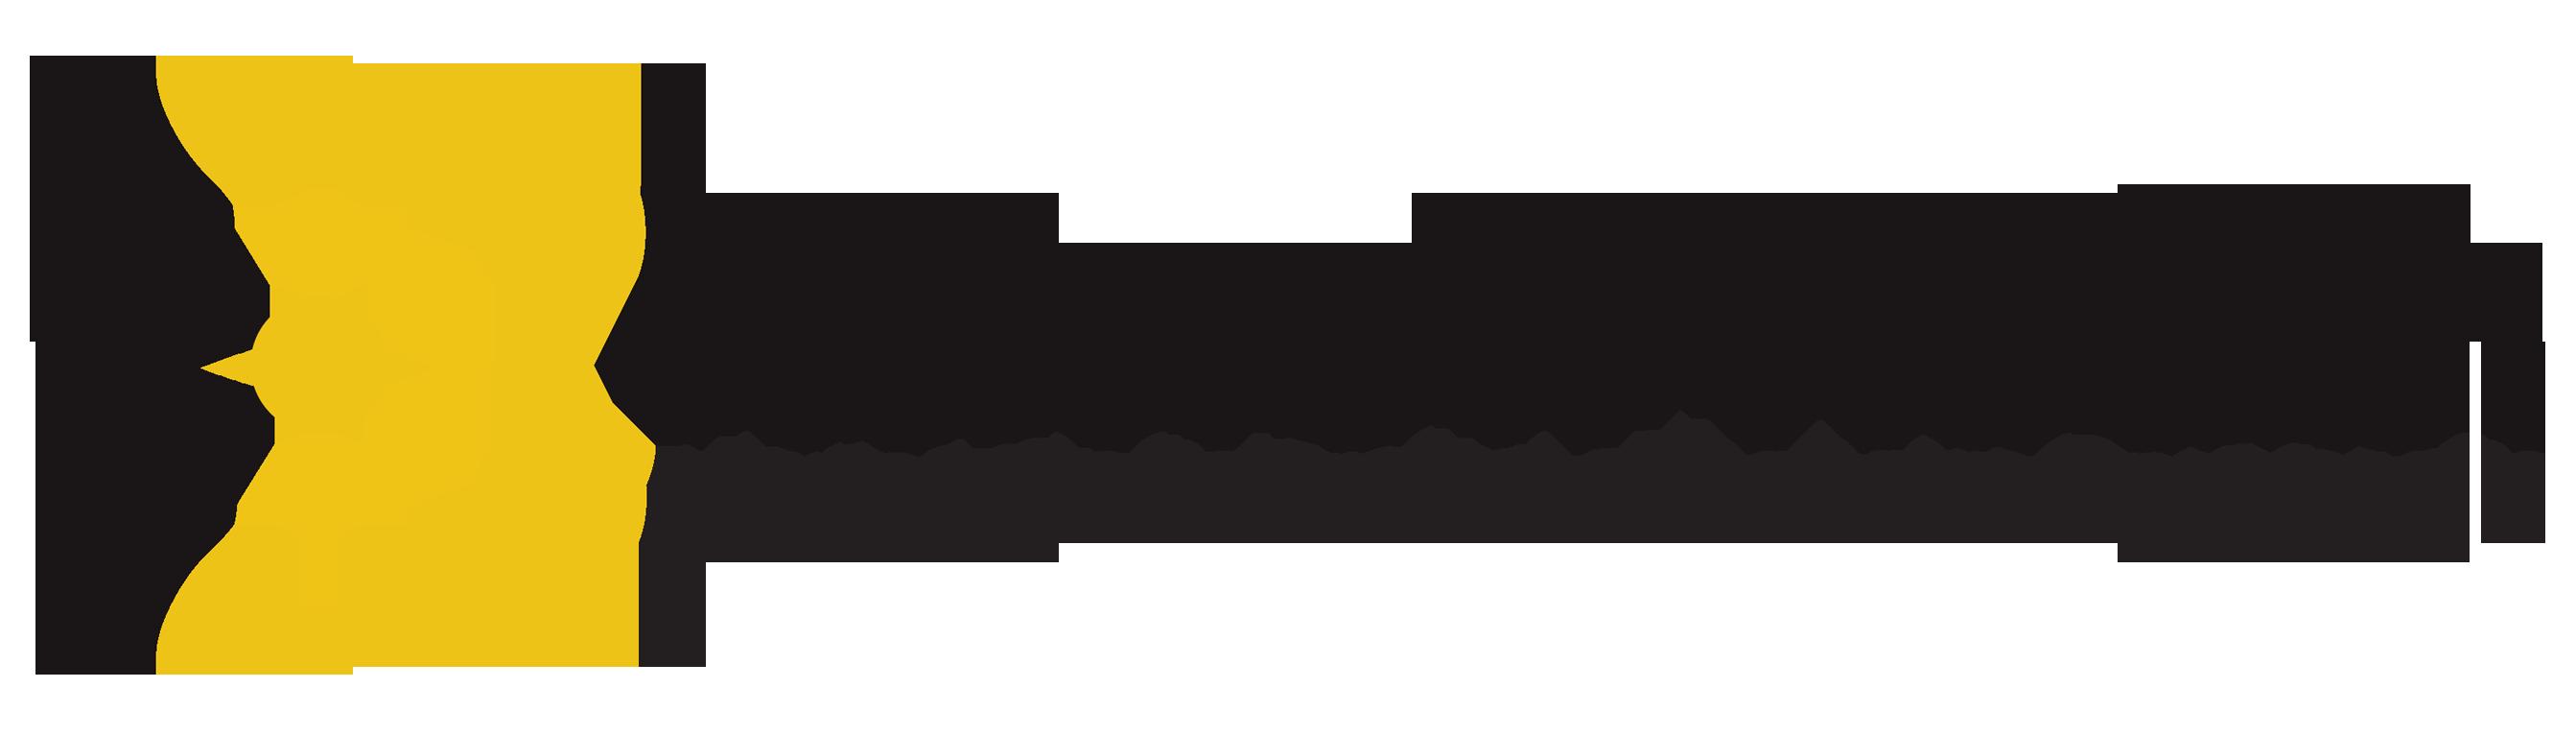 Kernow health CIC logo